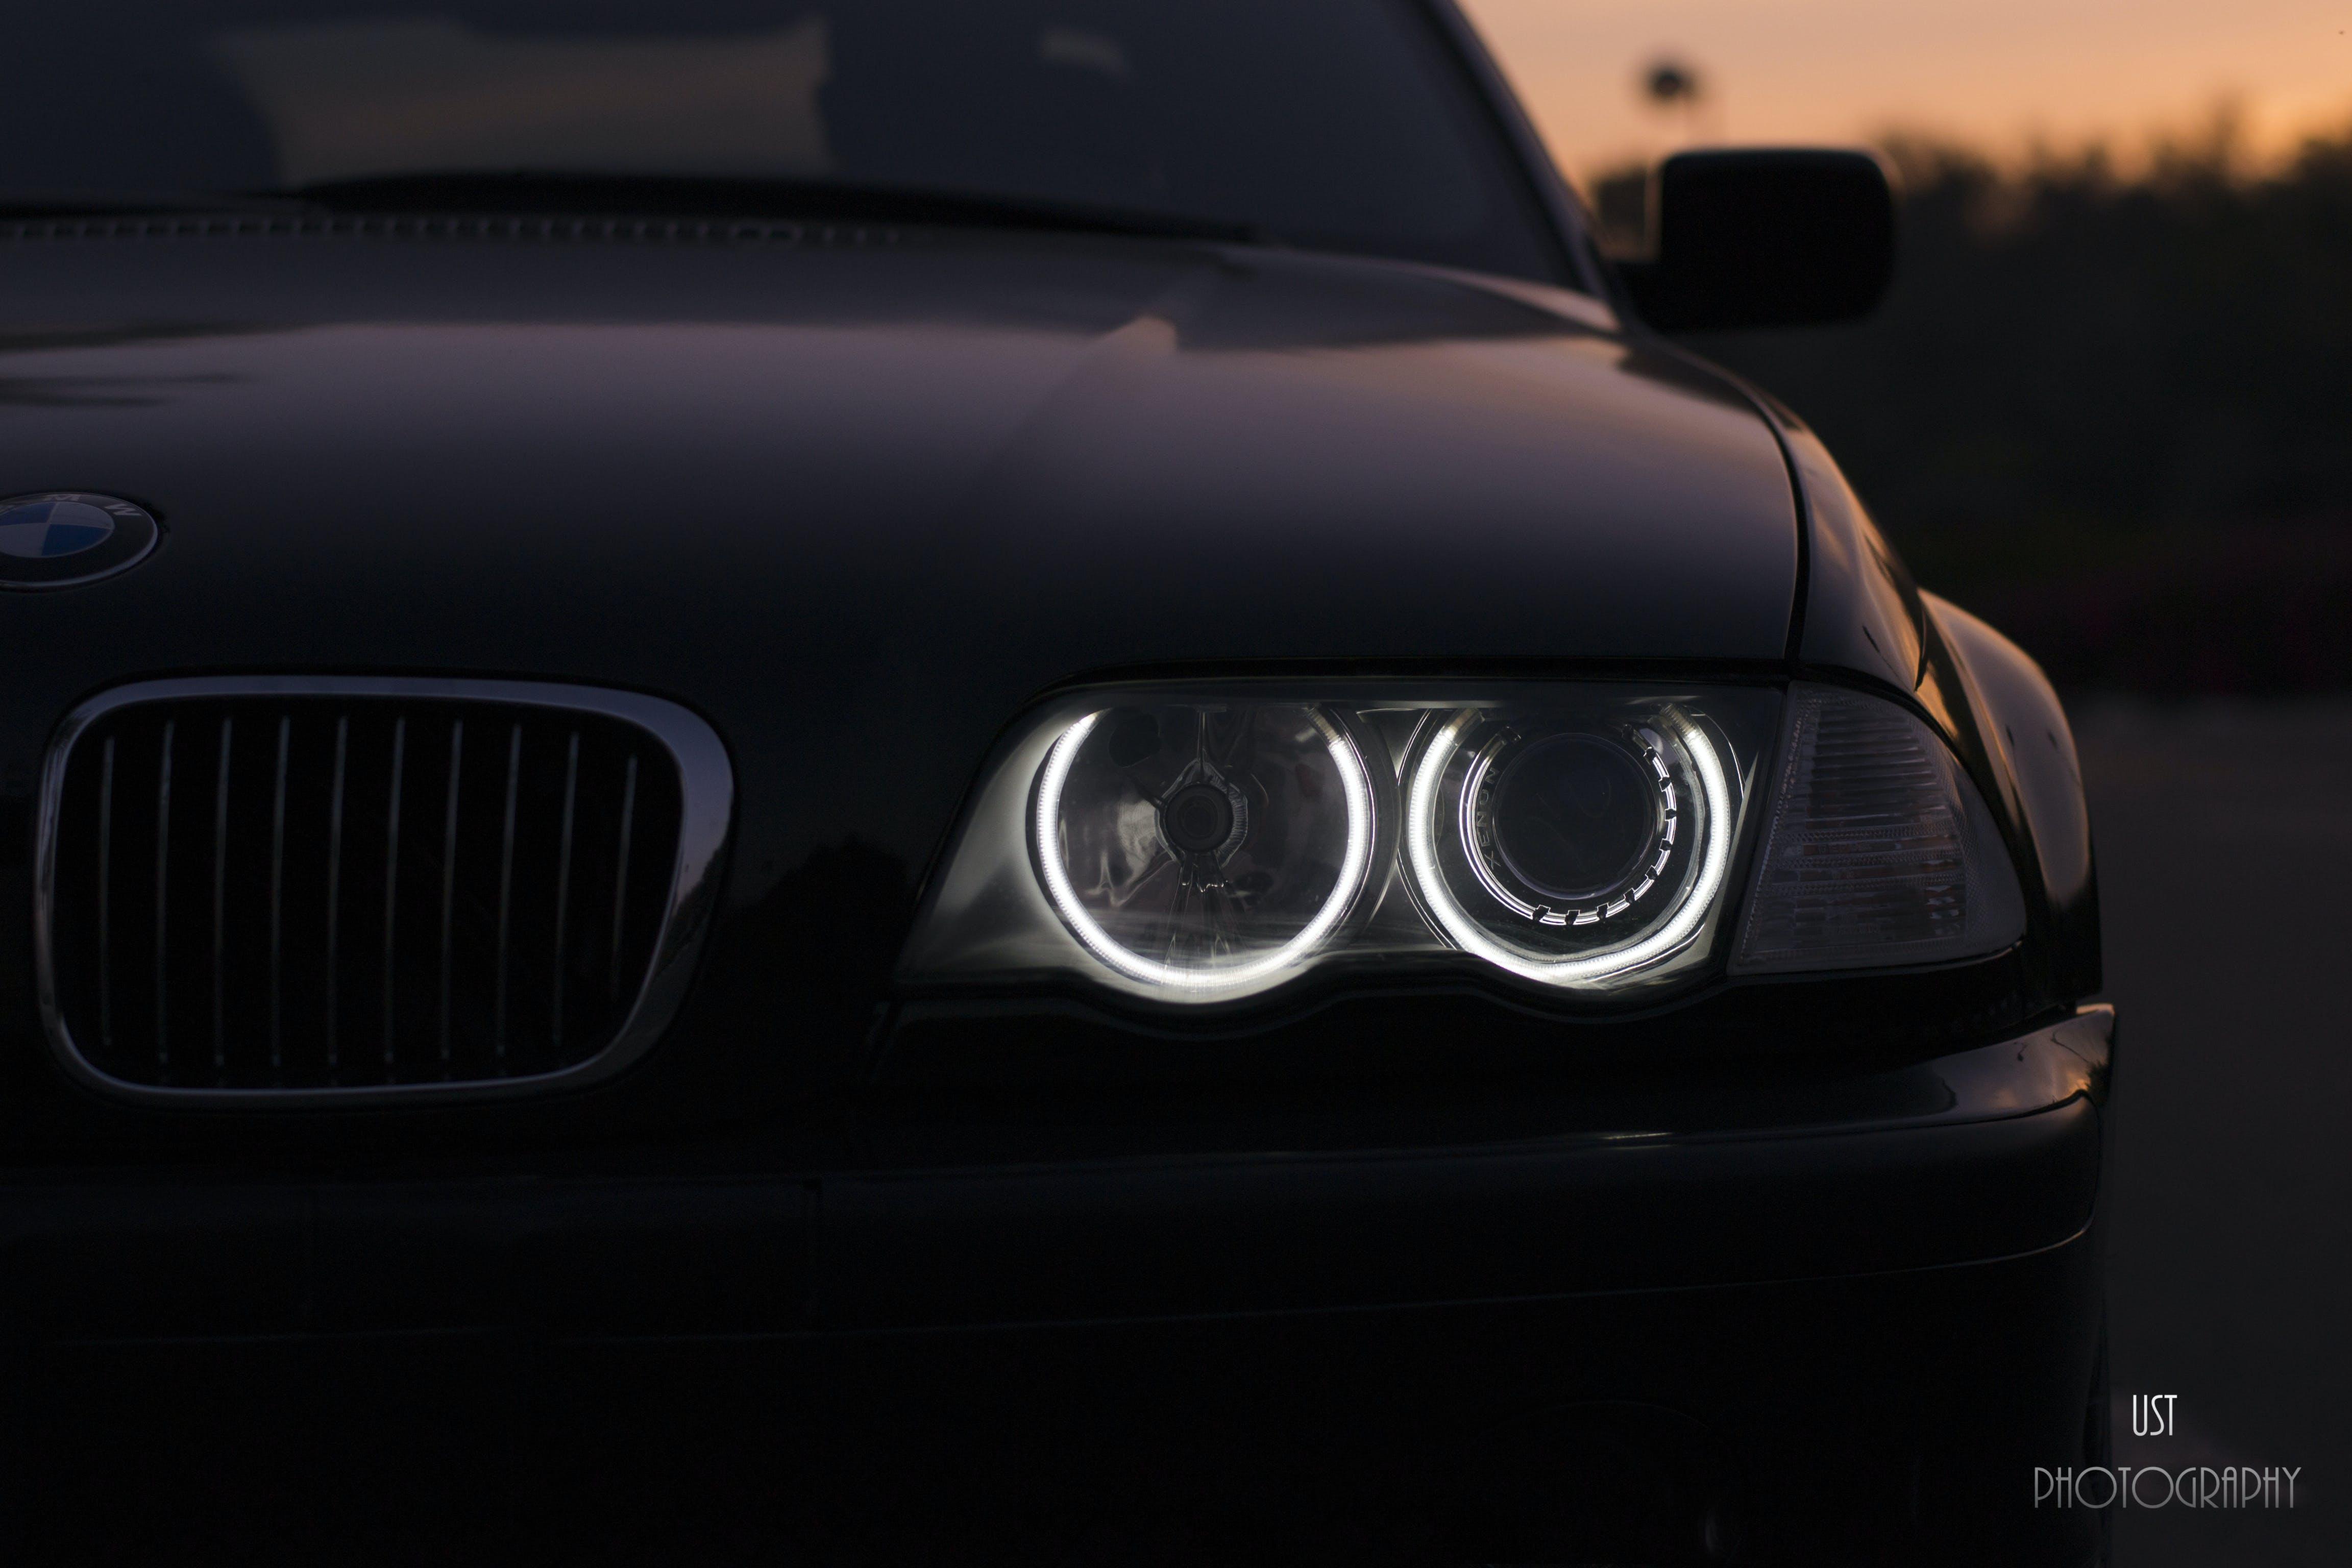 Free stock photo of BMW, car, E46, power